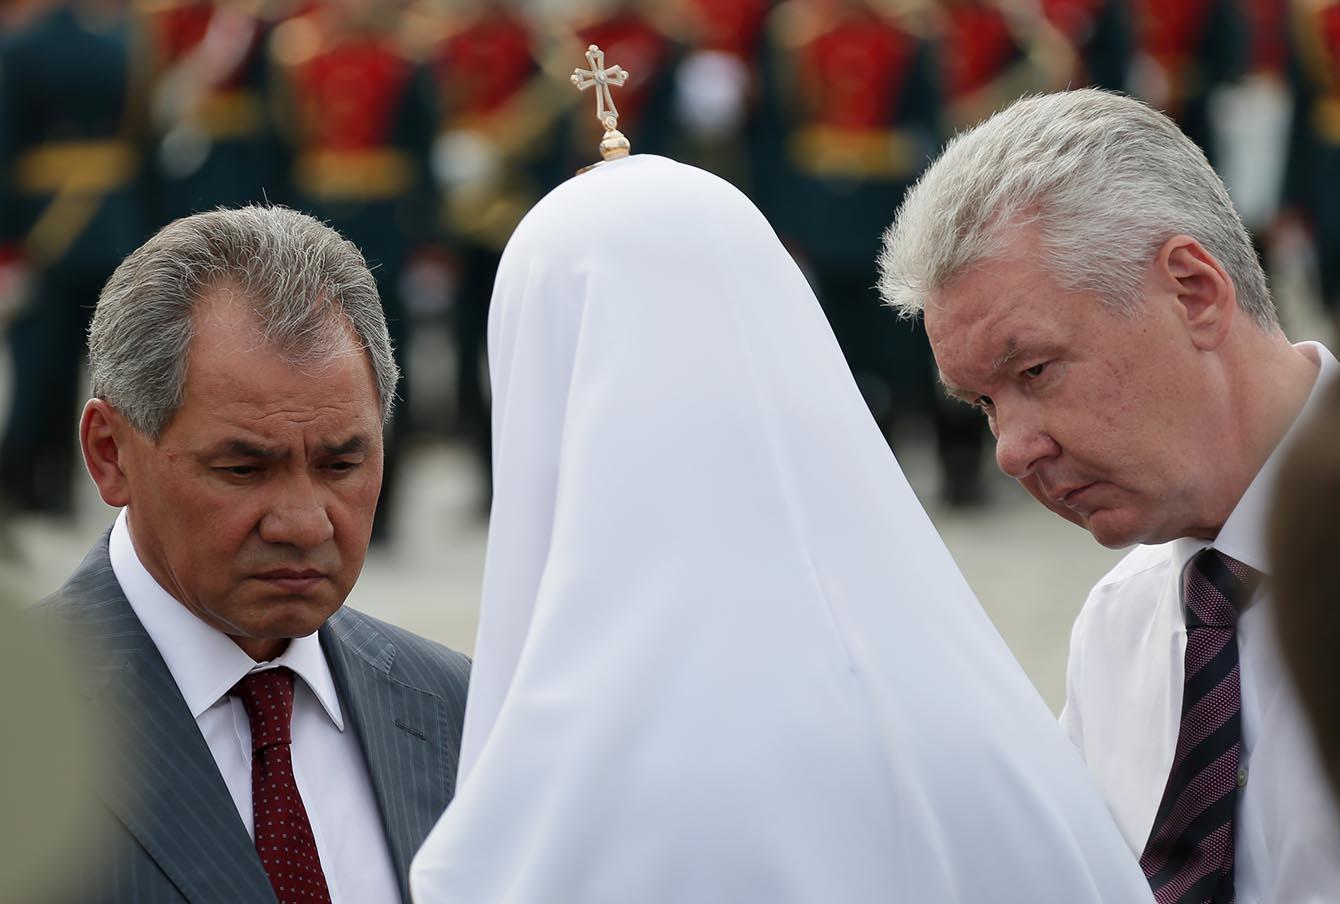 Сергей Шойгу, патриарх Кирилл и Сергей Собянин.